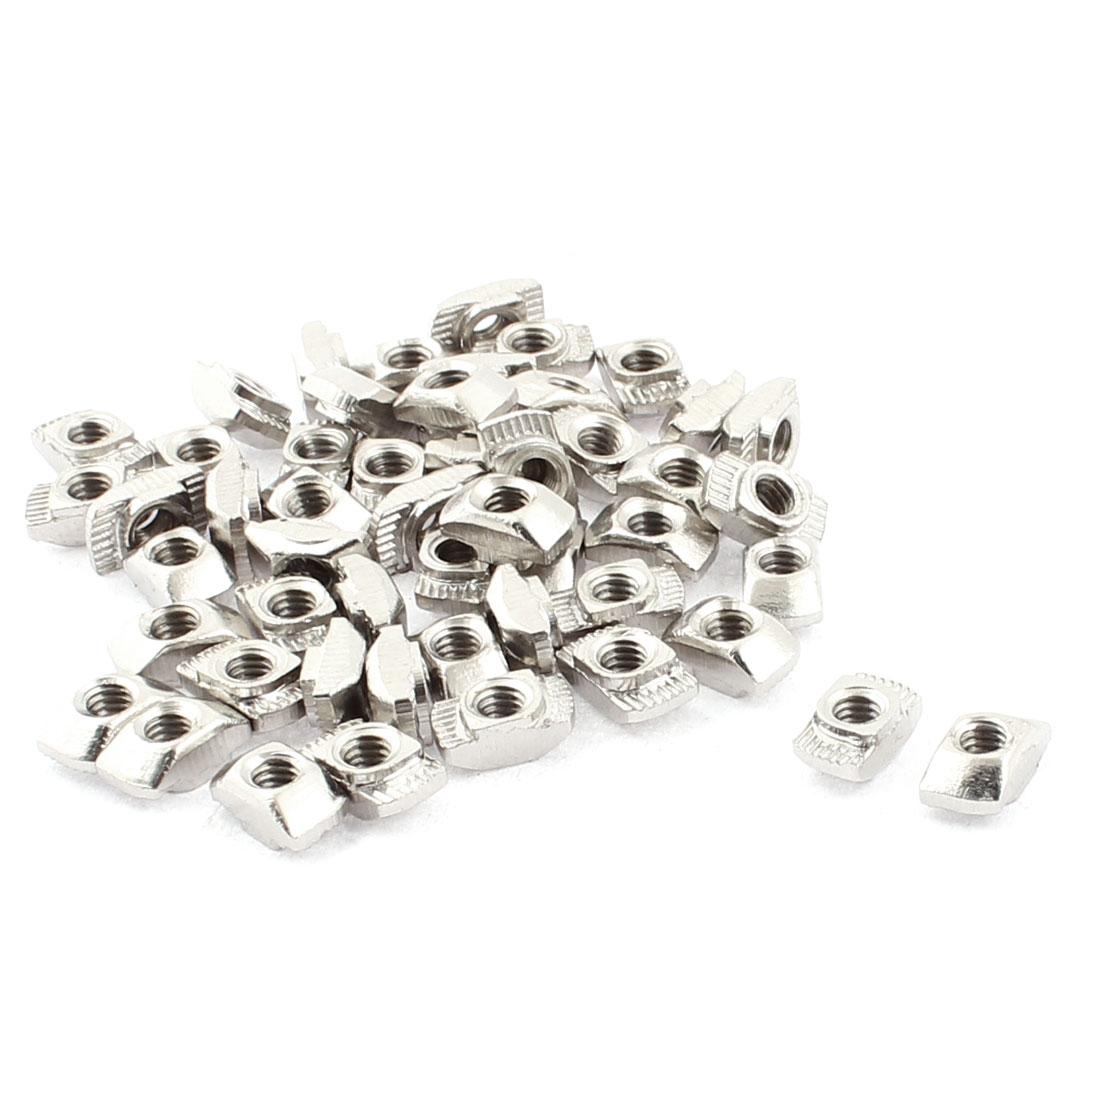 M4 Female Thread Metal T Slot Hammer Head Drop in Nut Silver Tone 50pcs